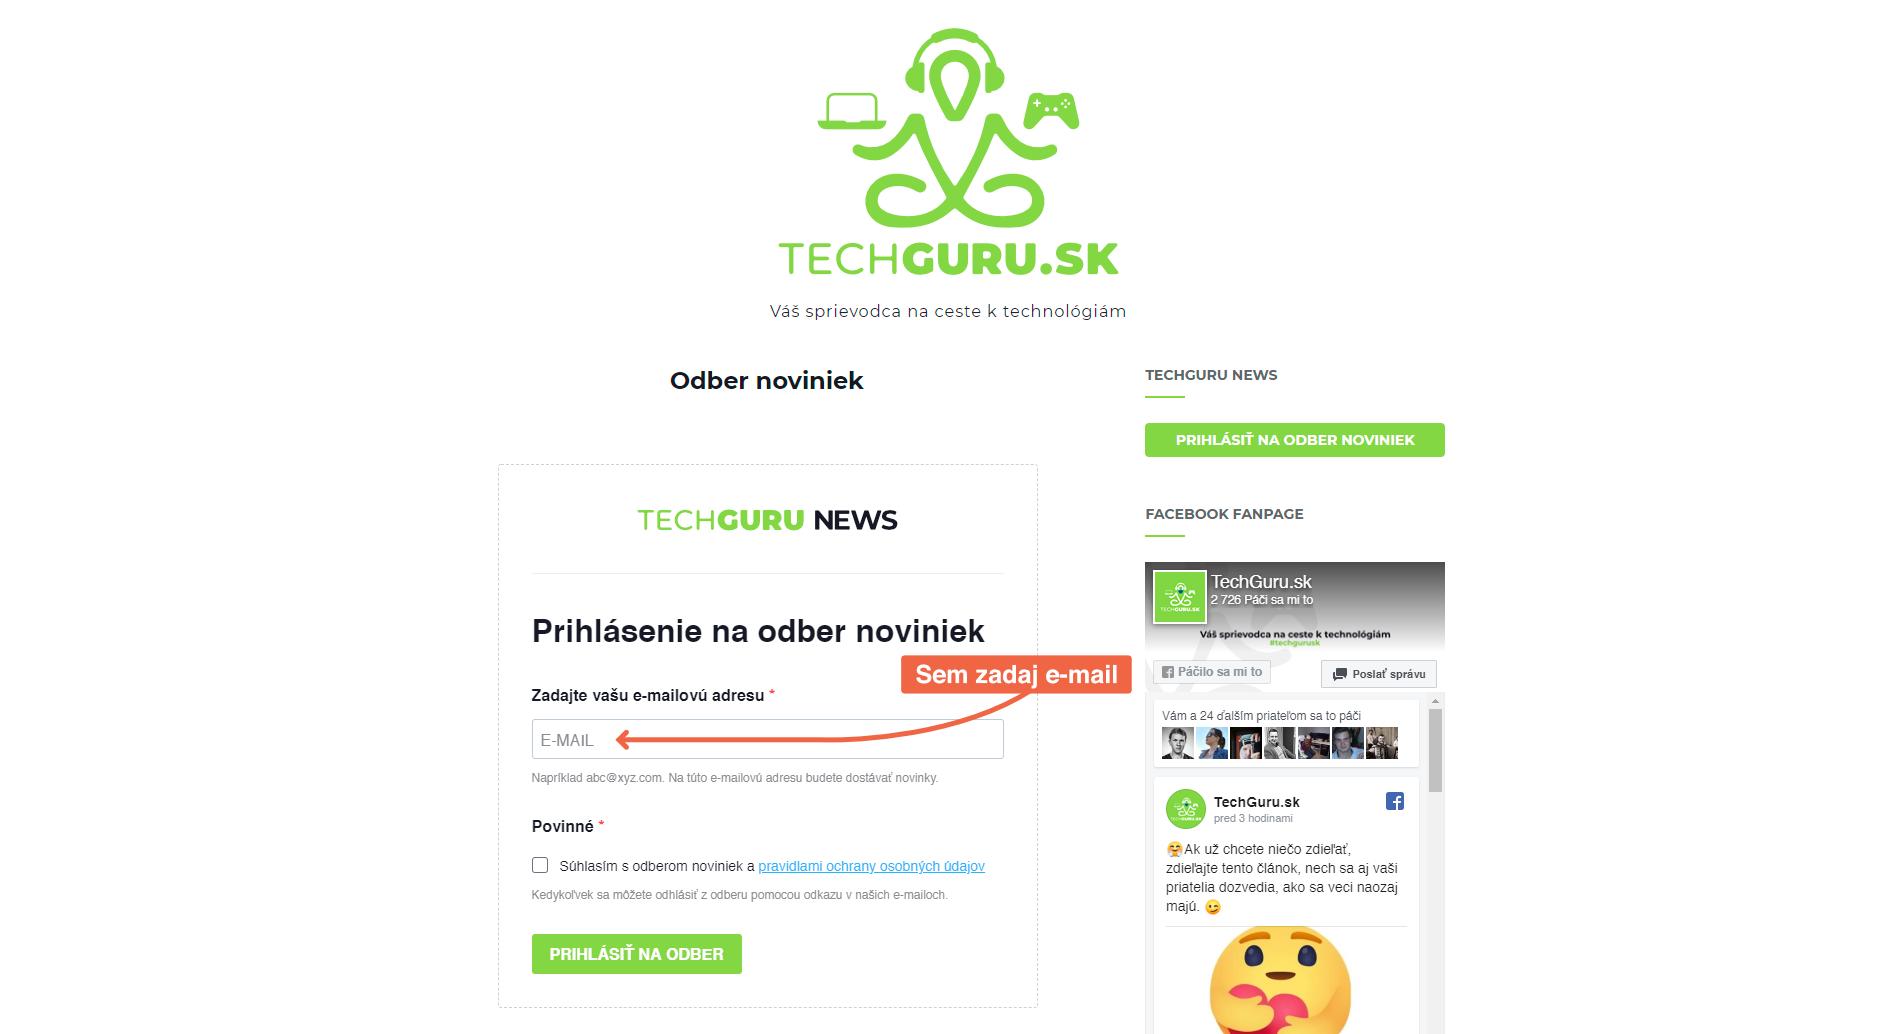 TechGuru NEWS